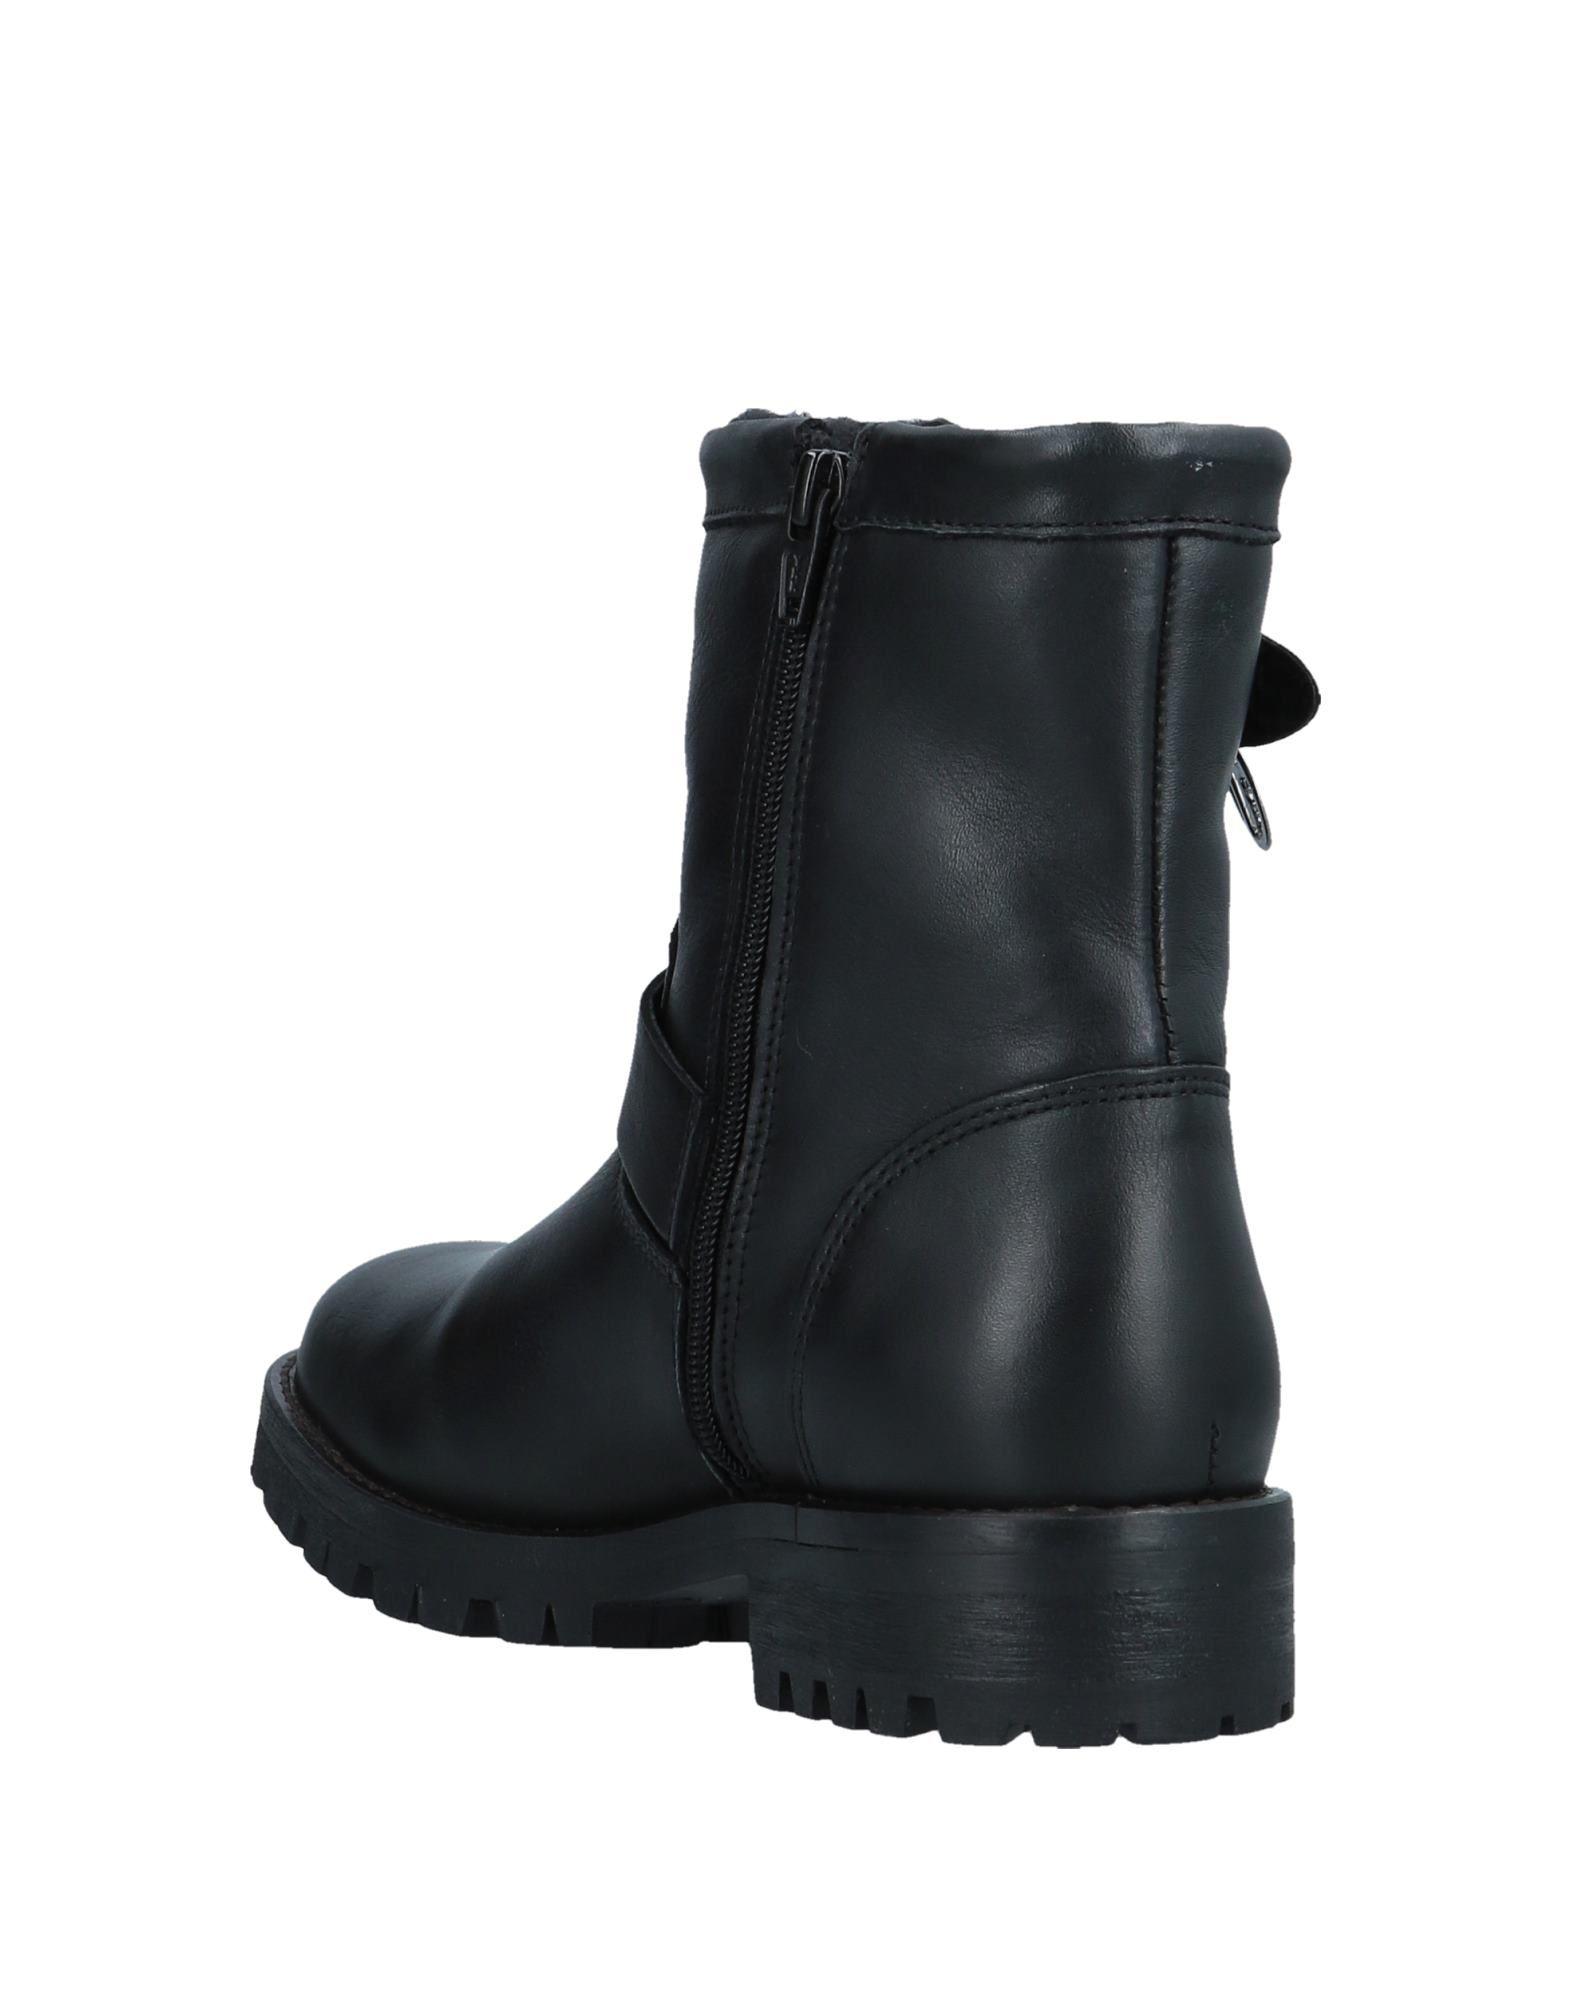 Gut um billige Stiefelette Schuhe zu tragenTrussardi Jeans Stiefelette billige Damen  11545994KU 4e52c3